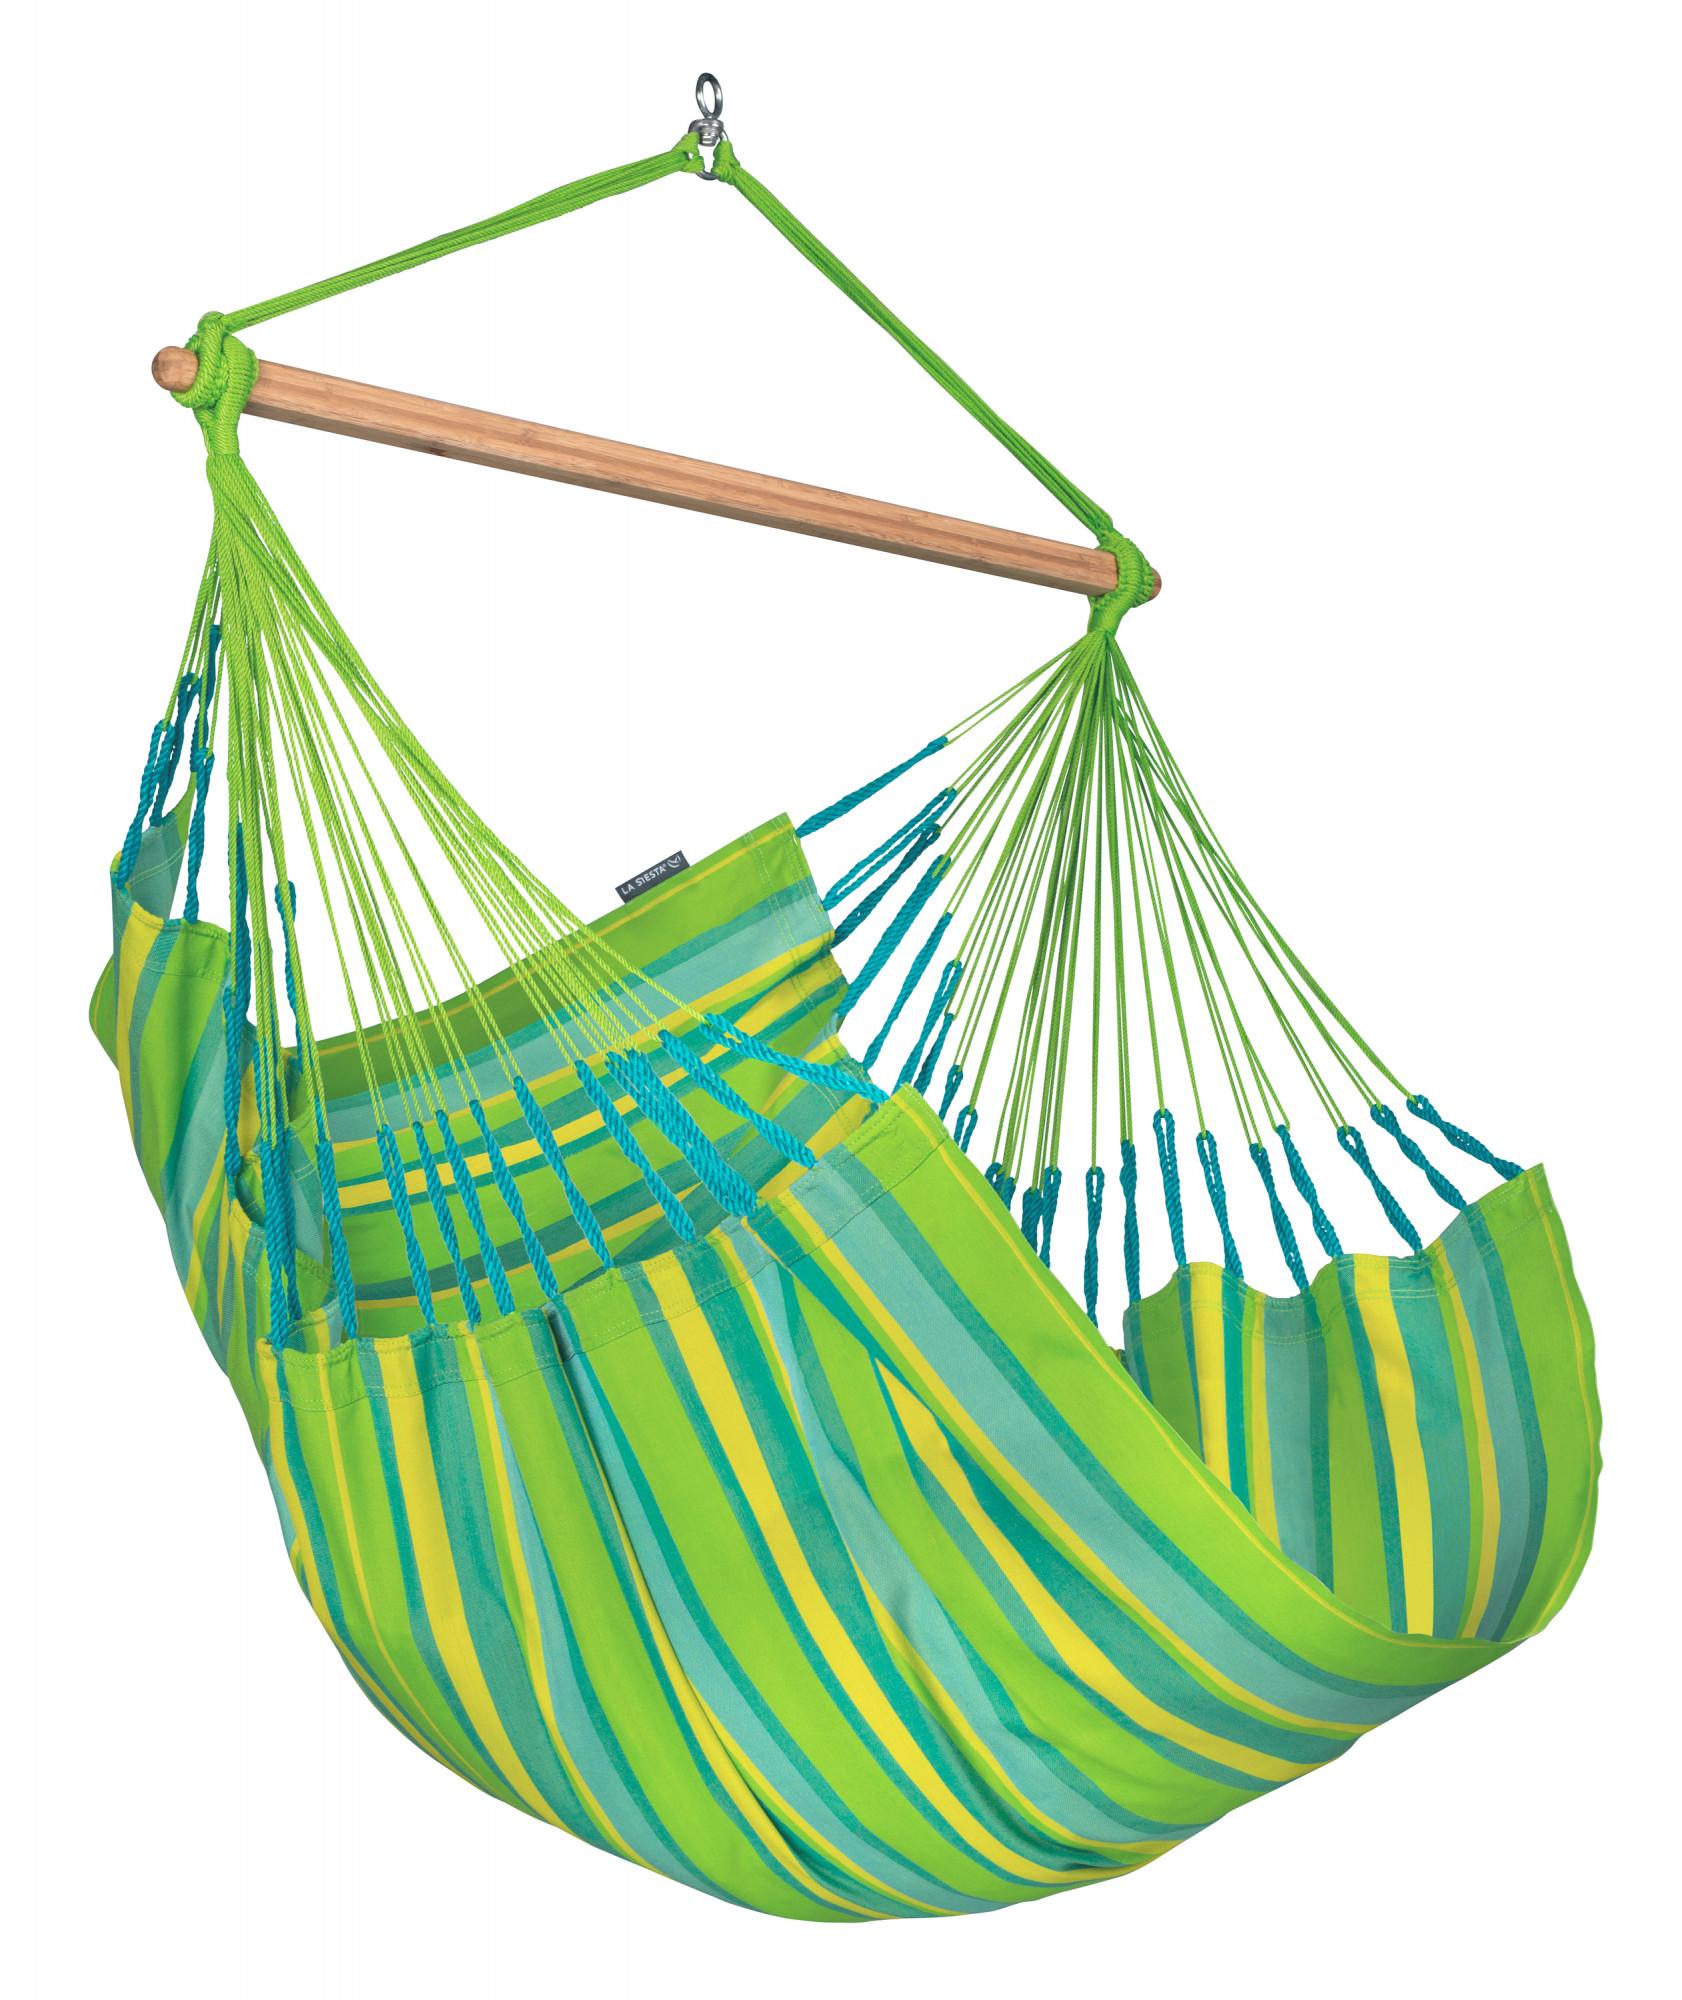 Chaise-hamac comfort en tissu vert citron